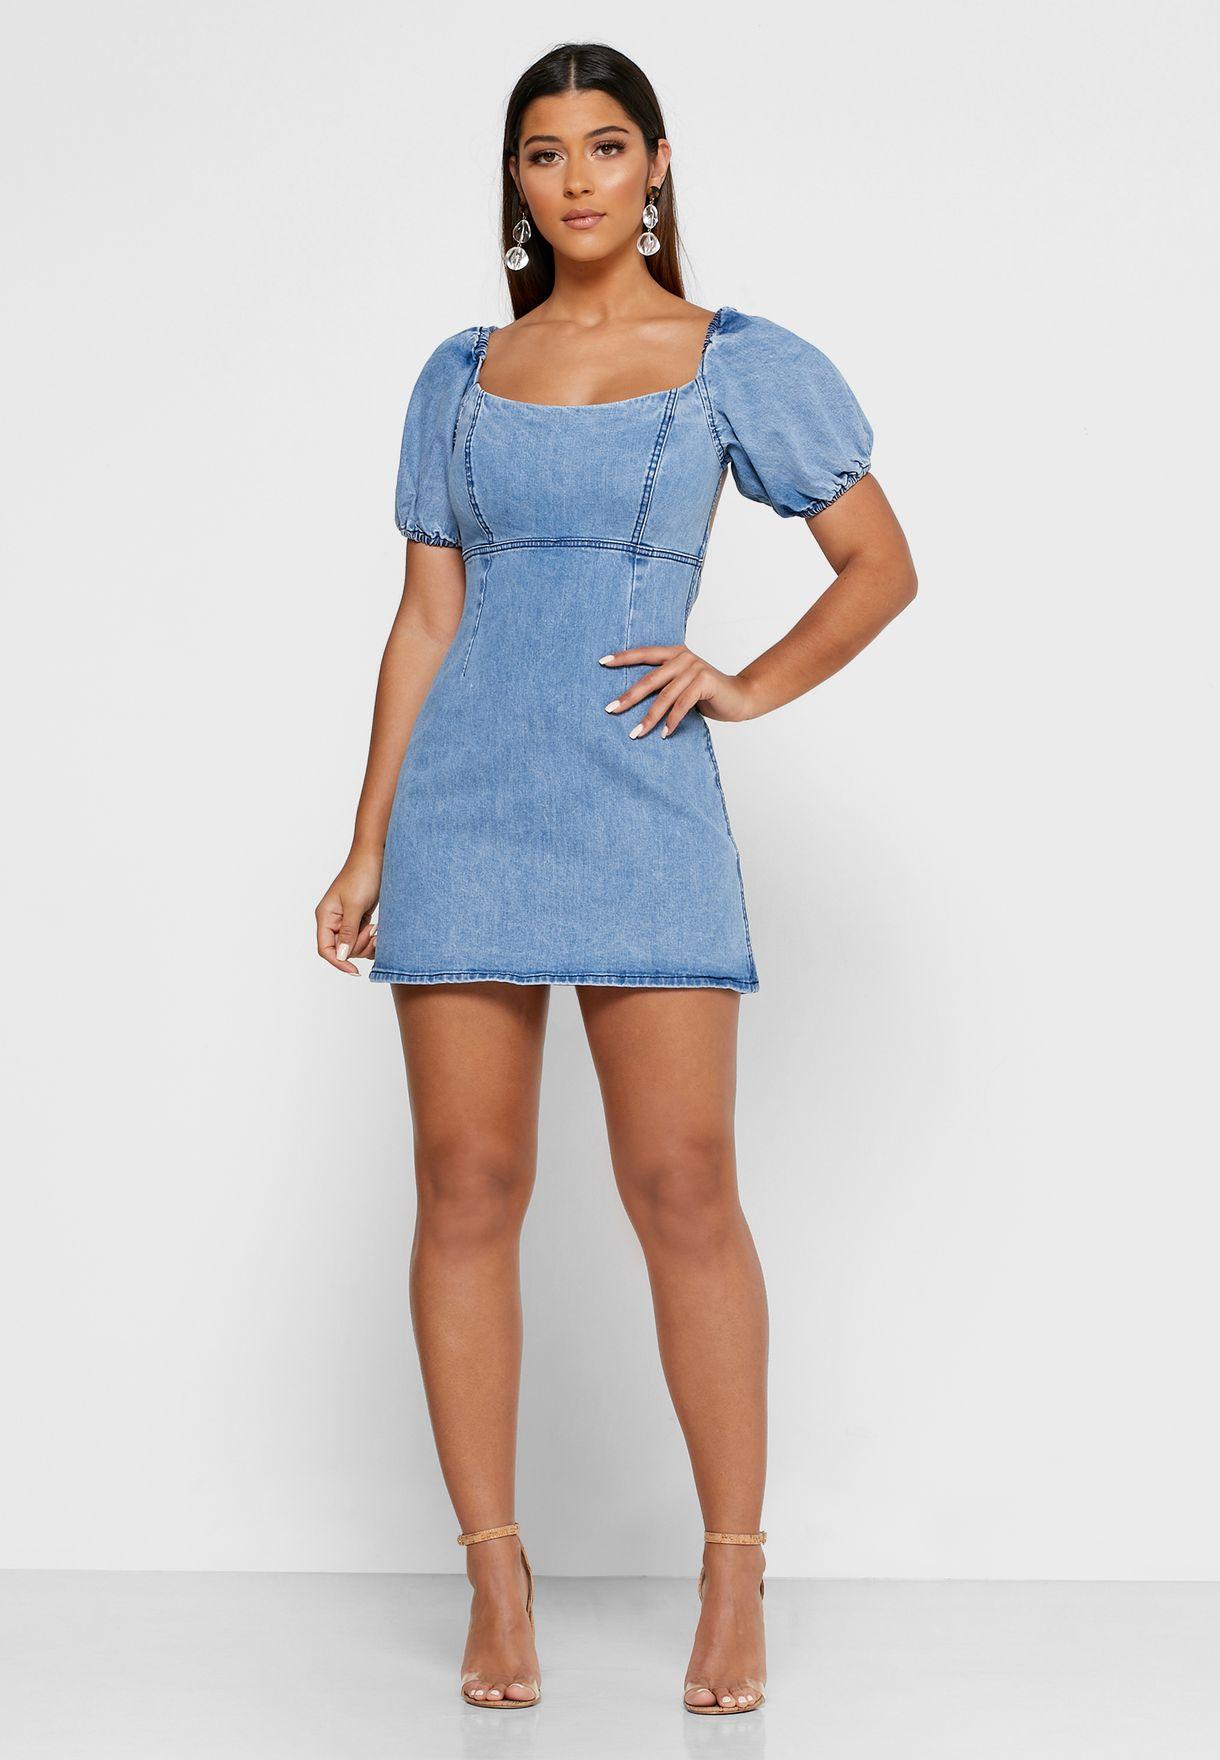 Coco Puff Sleeve Denim Dress